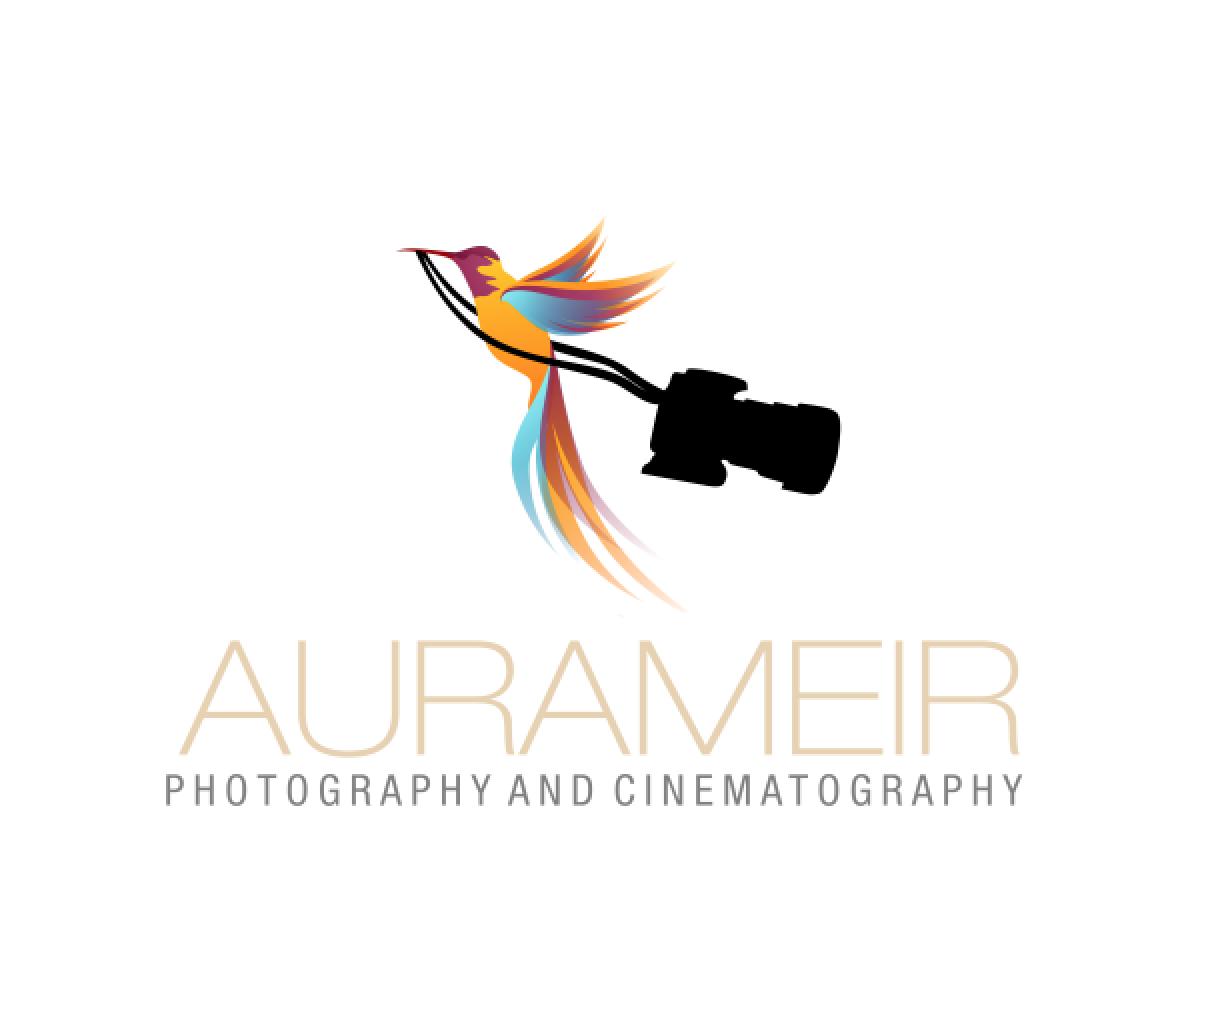 15 Logo Design Camera Photography PNG Images.